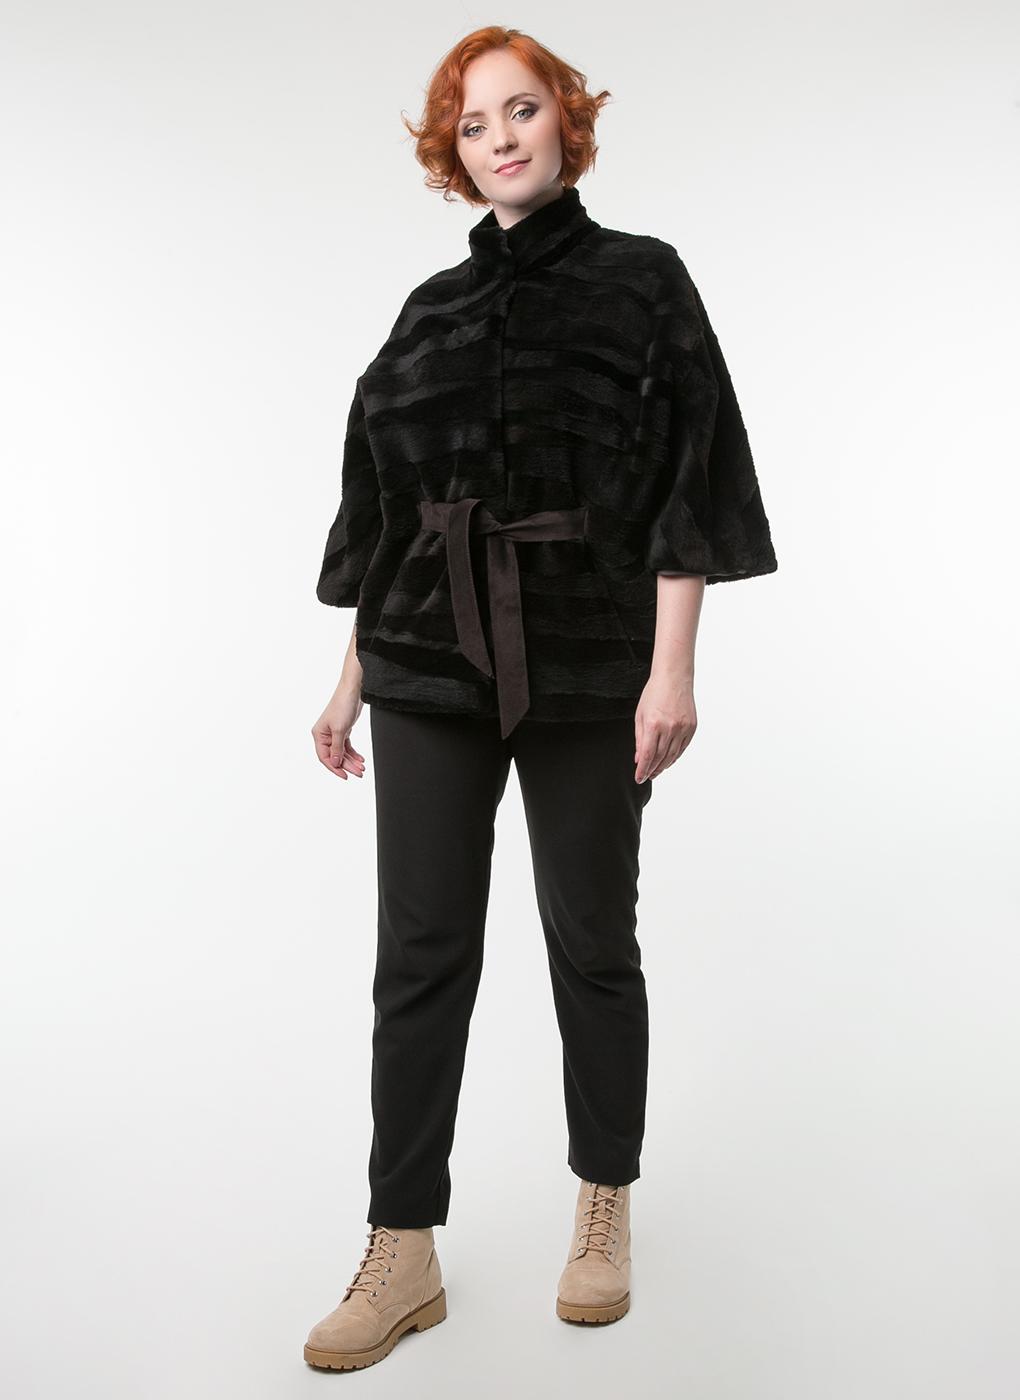 Куртка из нутрии Дея 01, Dzhanbekoff